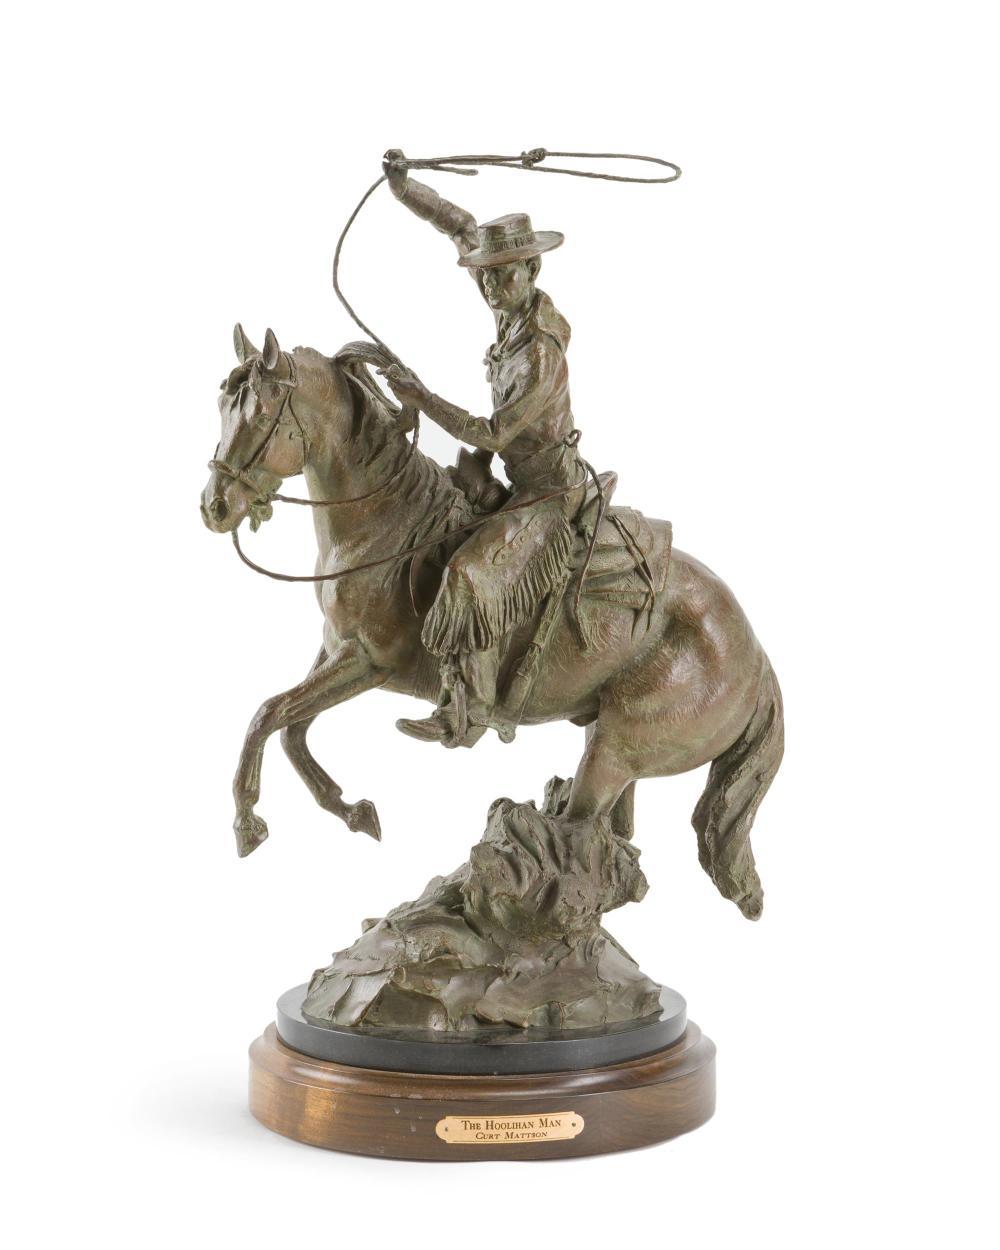 "Curt Mattson, (b. 1956 Arizona), ""The Hoolihan Man,"" 2006, Patinated bronze on wood and black granite rotating plinth, 20.75"" H x 14"" W"